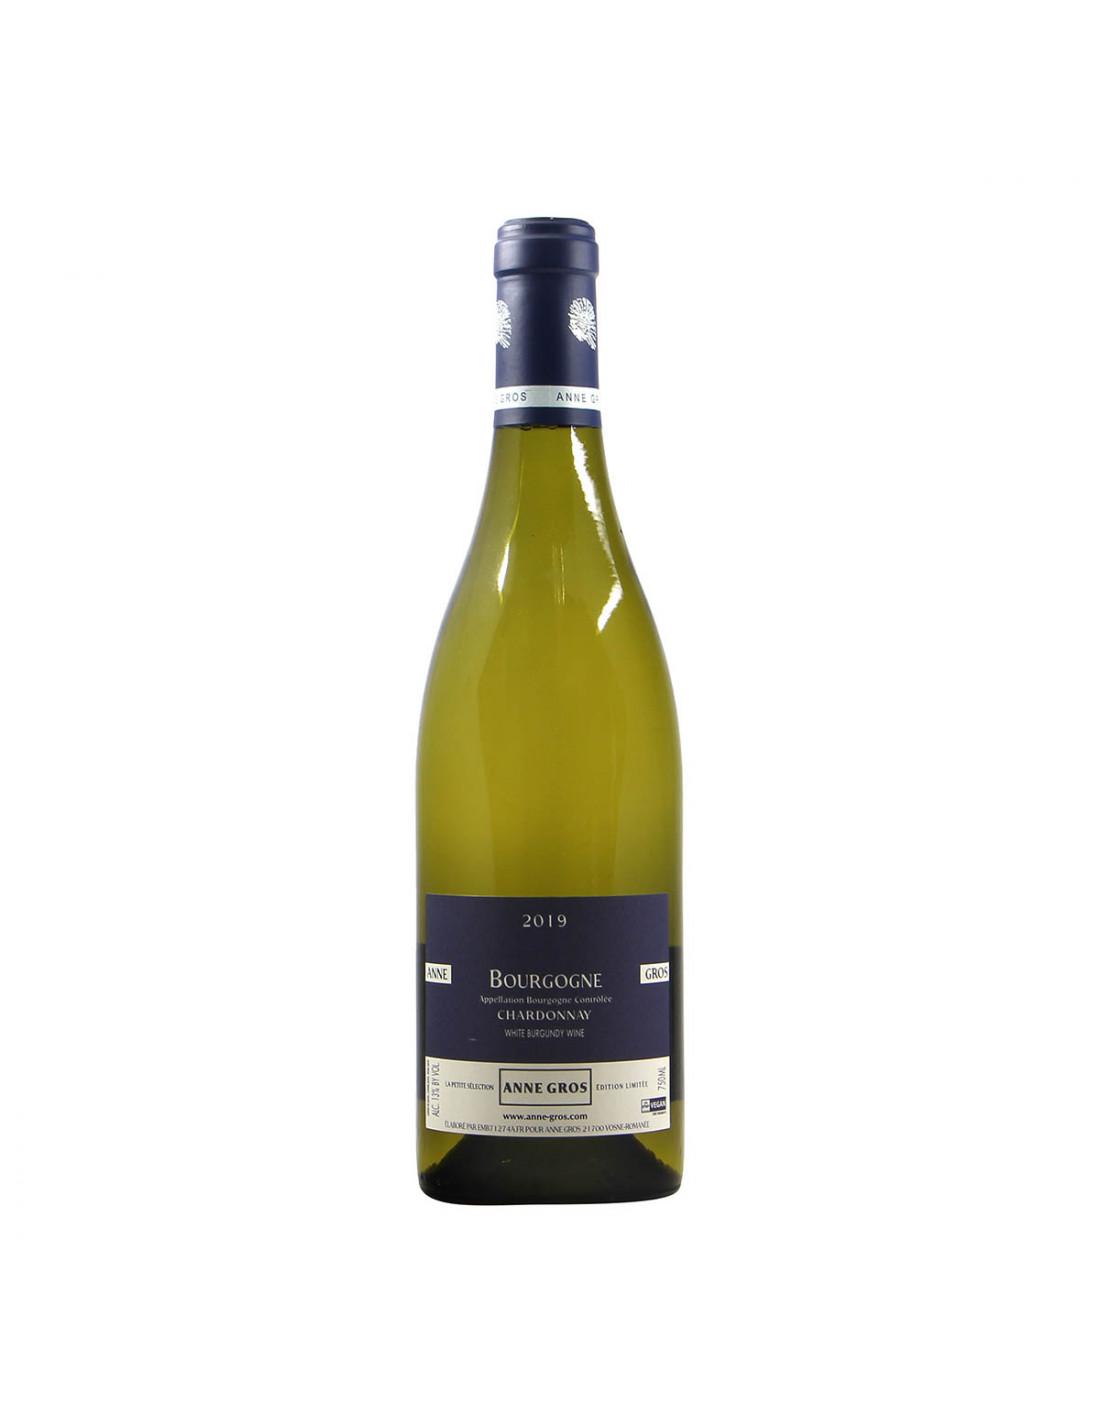 Anne Gros Bourgogne Chardonnay La Petite Selection 2019 Grandi Bottiglie